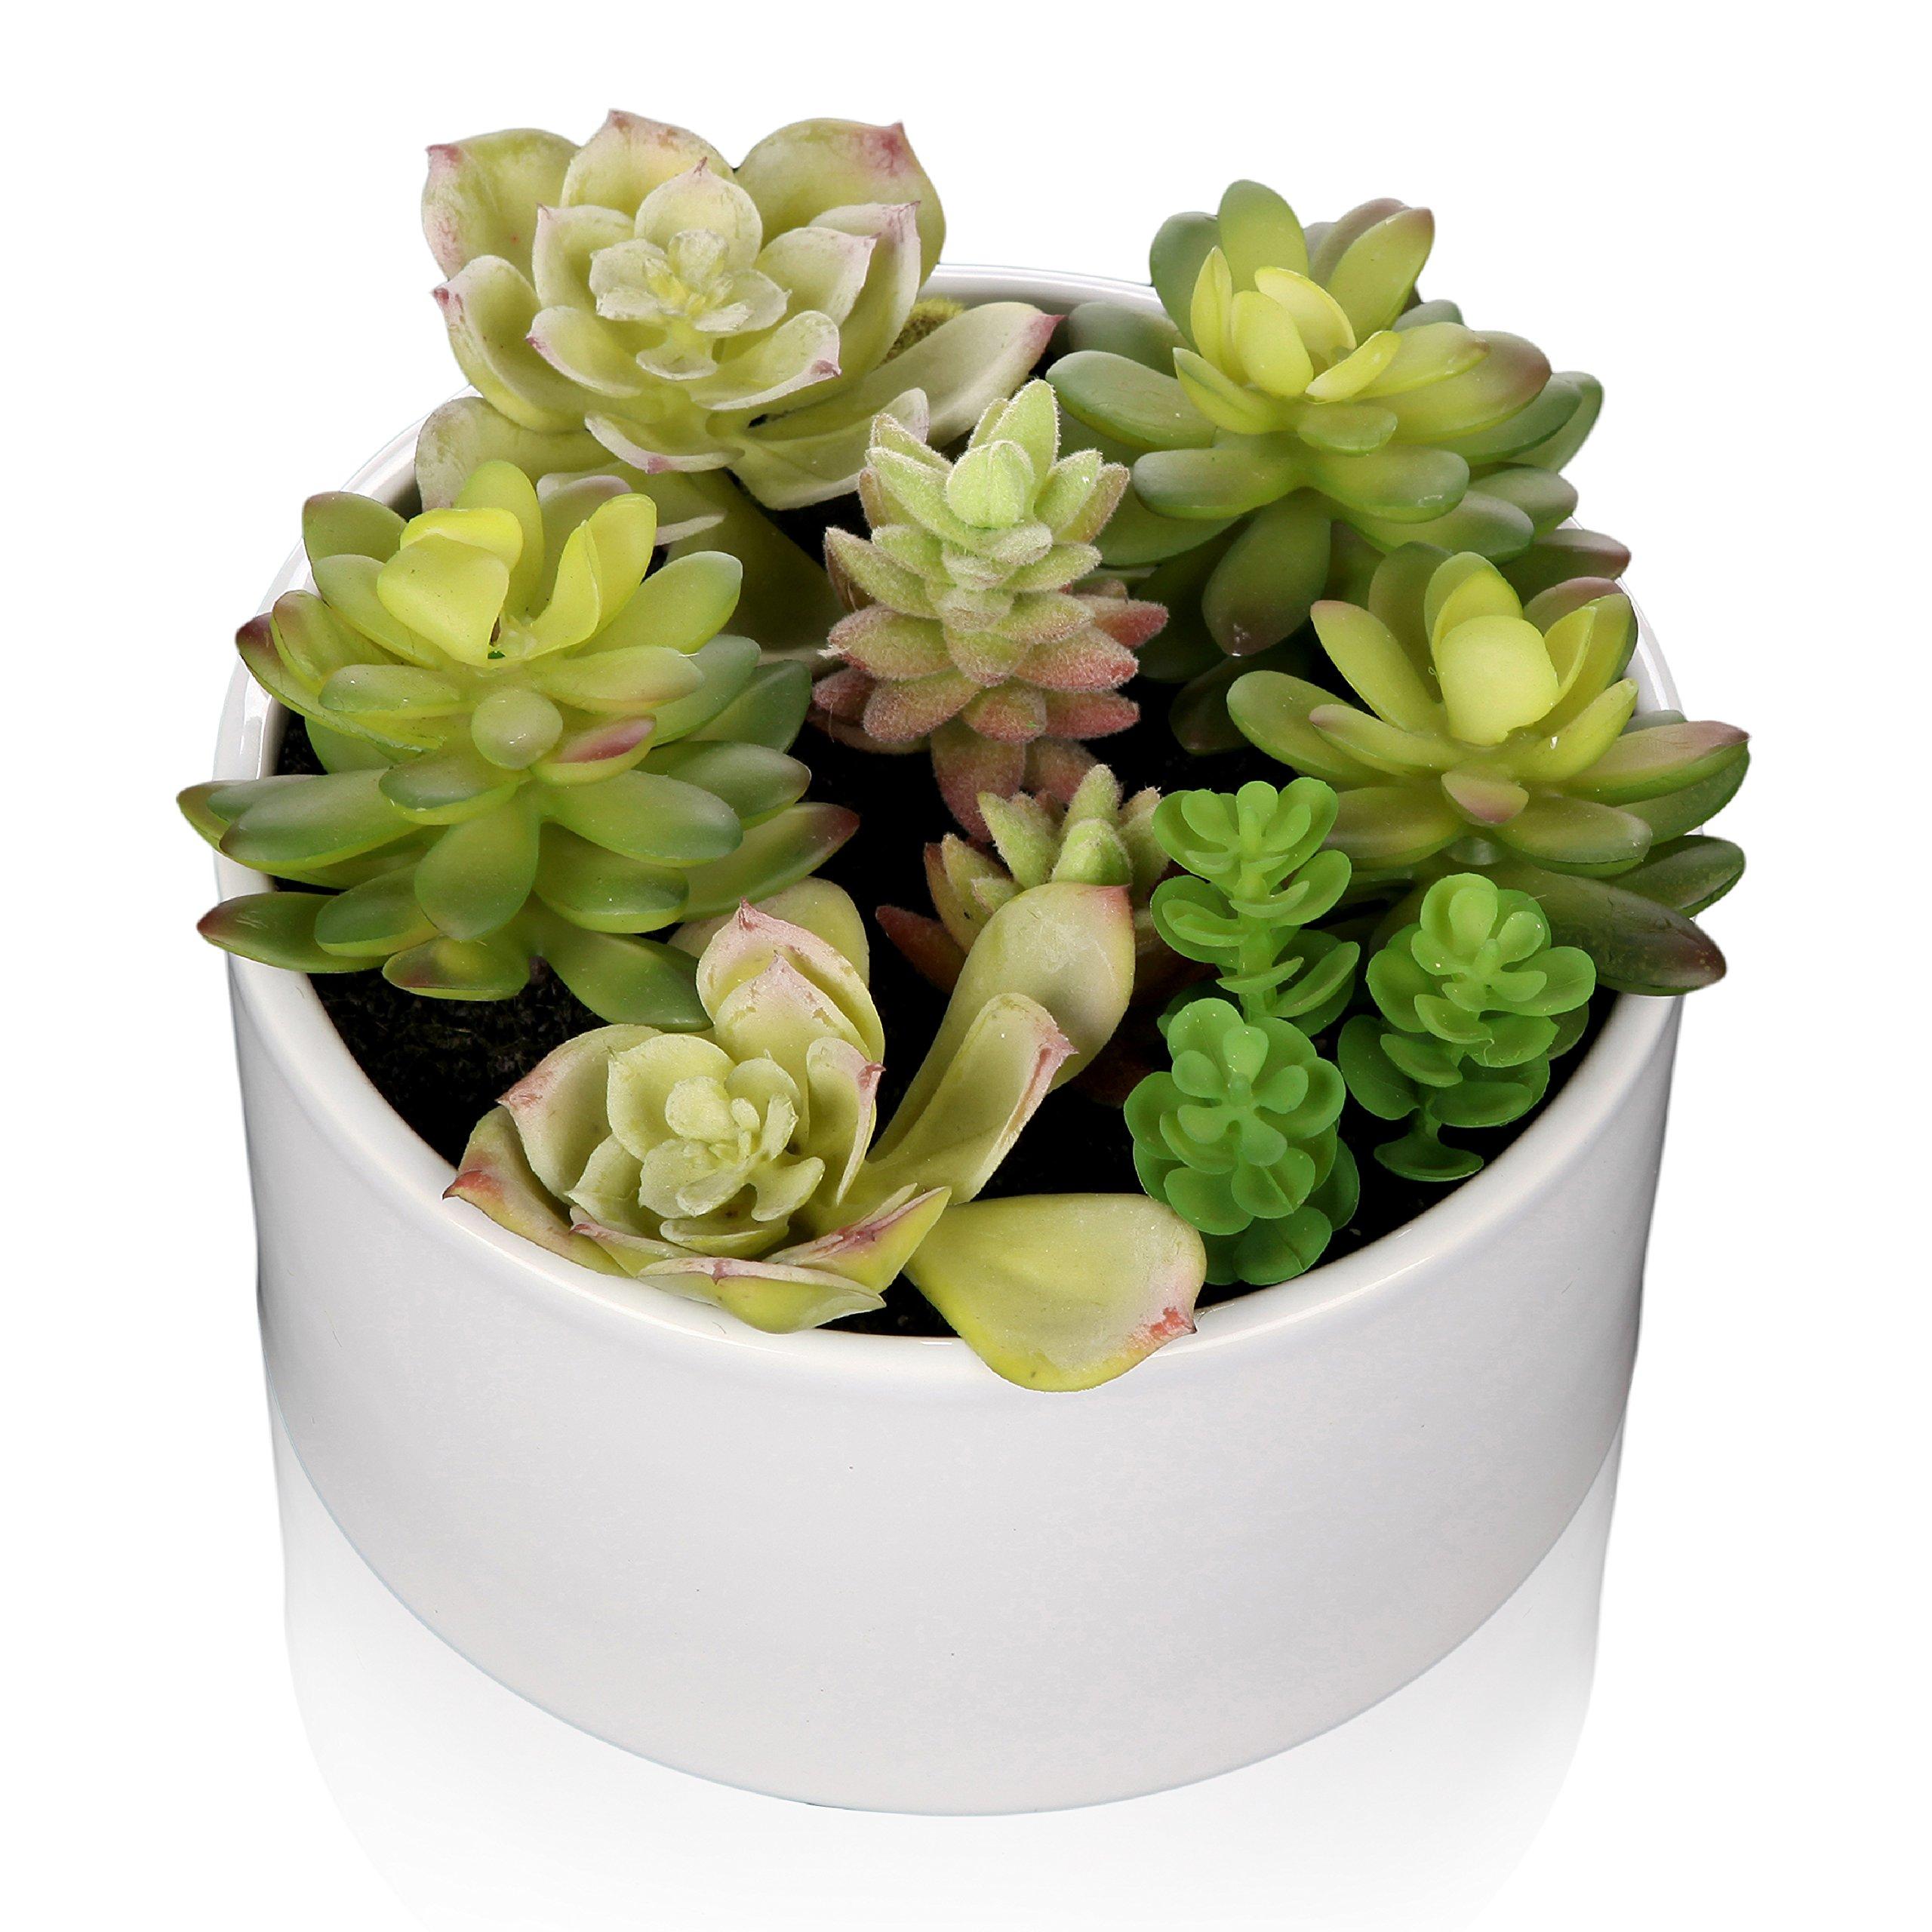 MyGift 6 inch Realistic Artificial Faux Mixed Succulent Plants Arrangement w/ White Round Ceramic Vase